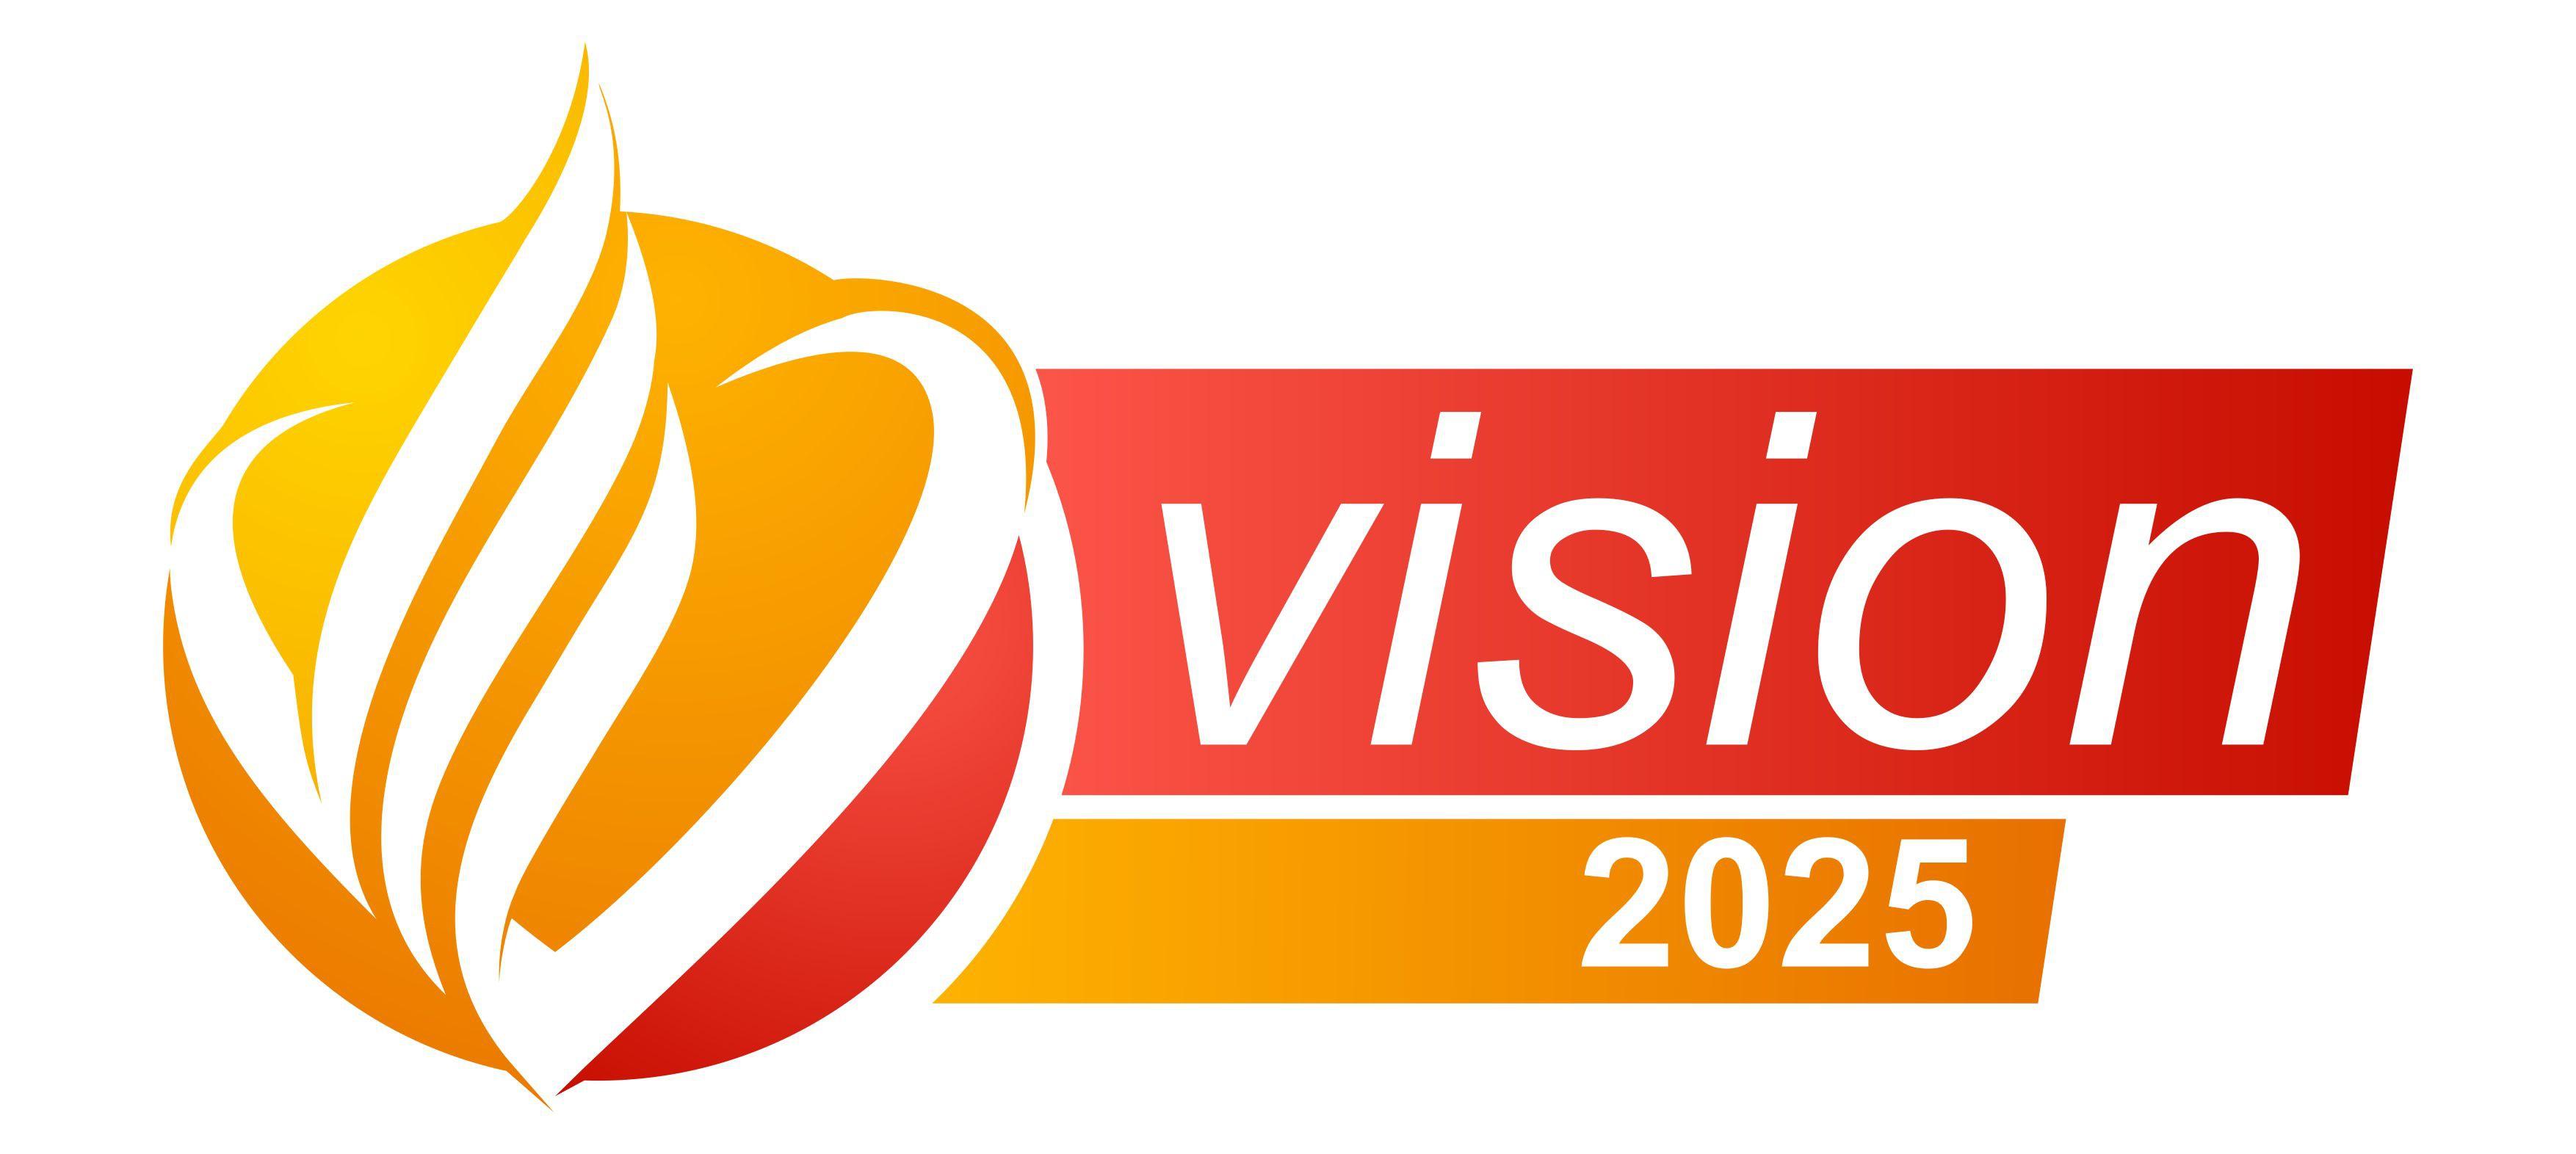 Design a logo for a dynamic vision for a progressive Christian community